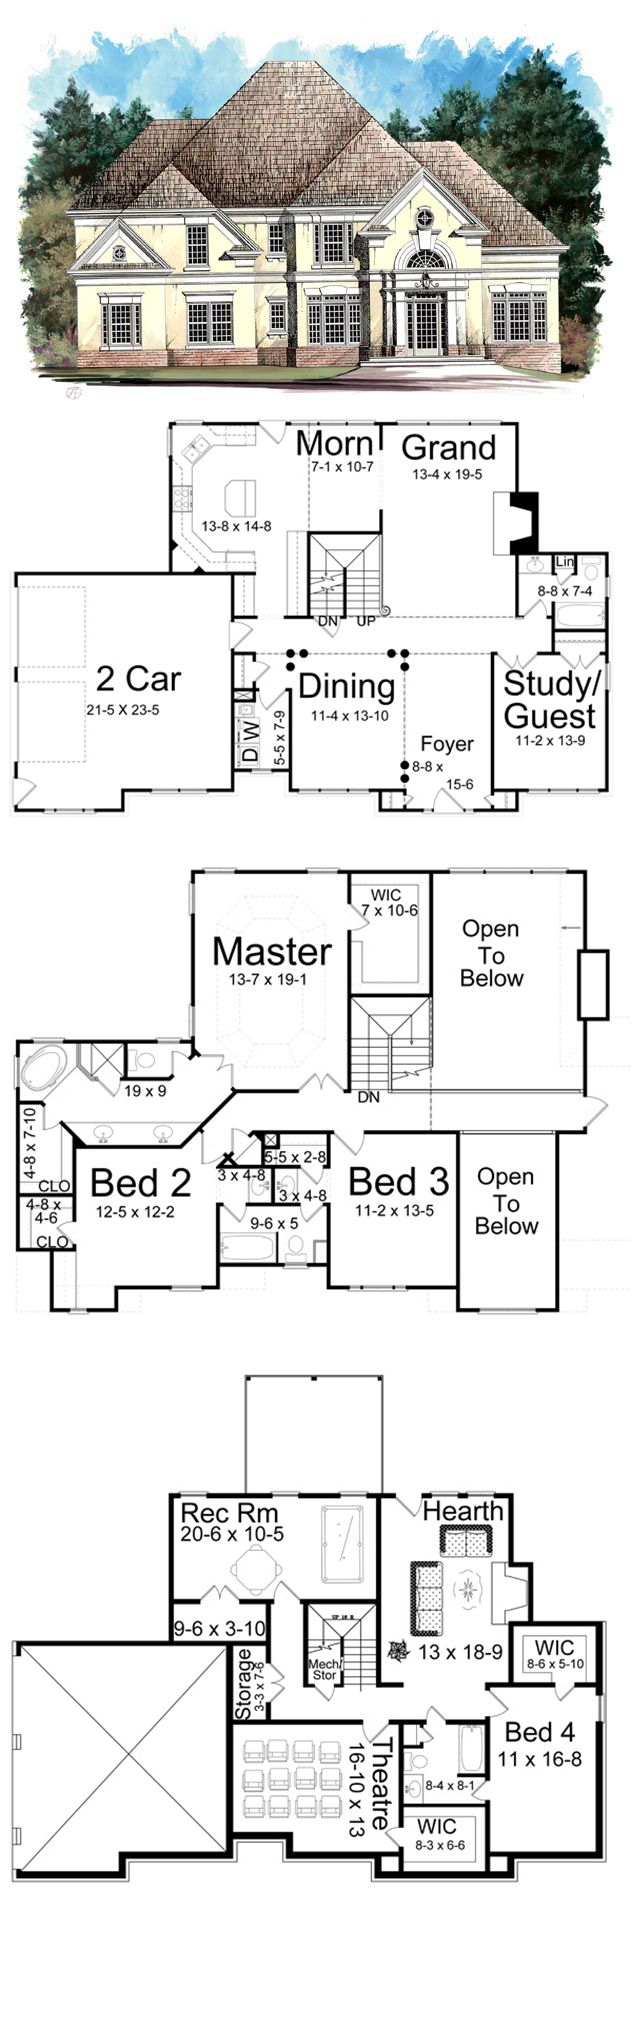 342 best perfect house plans images on pinterest house floor 342 best perfect house plans images on pinterest house floor plans dream house plans and house design